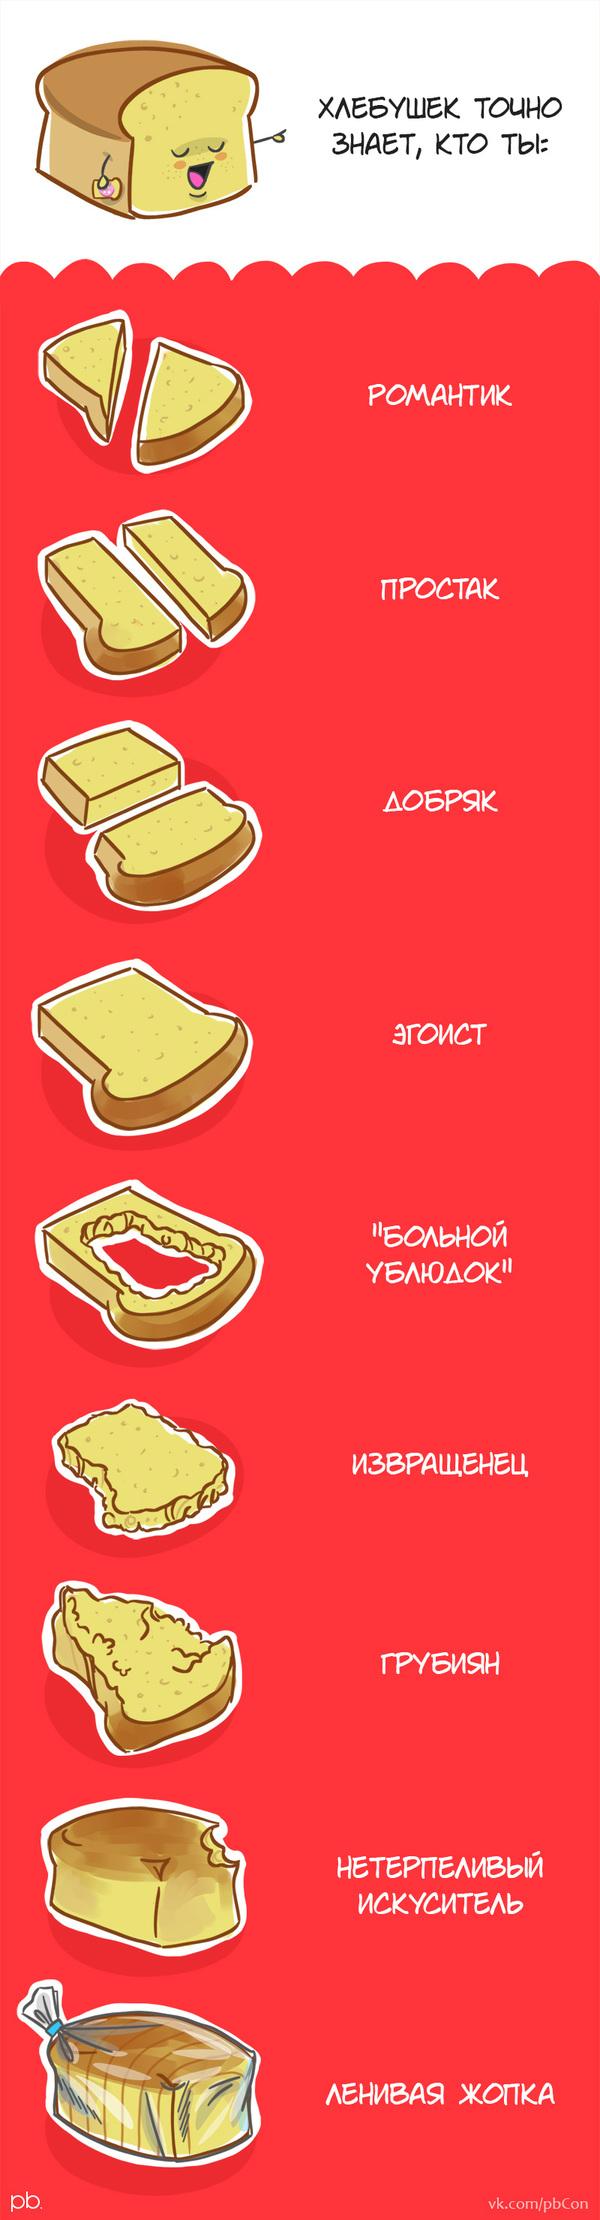 А кто ты? pbcon, хлеб, юмор, Комиксы, длиннопост